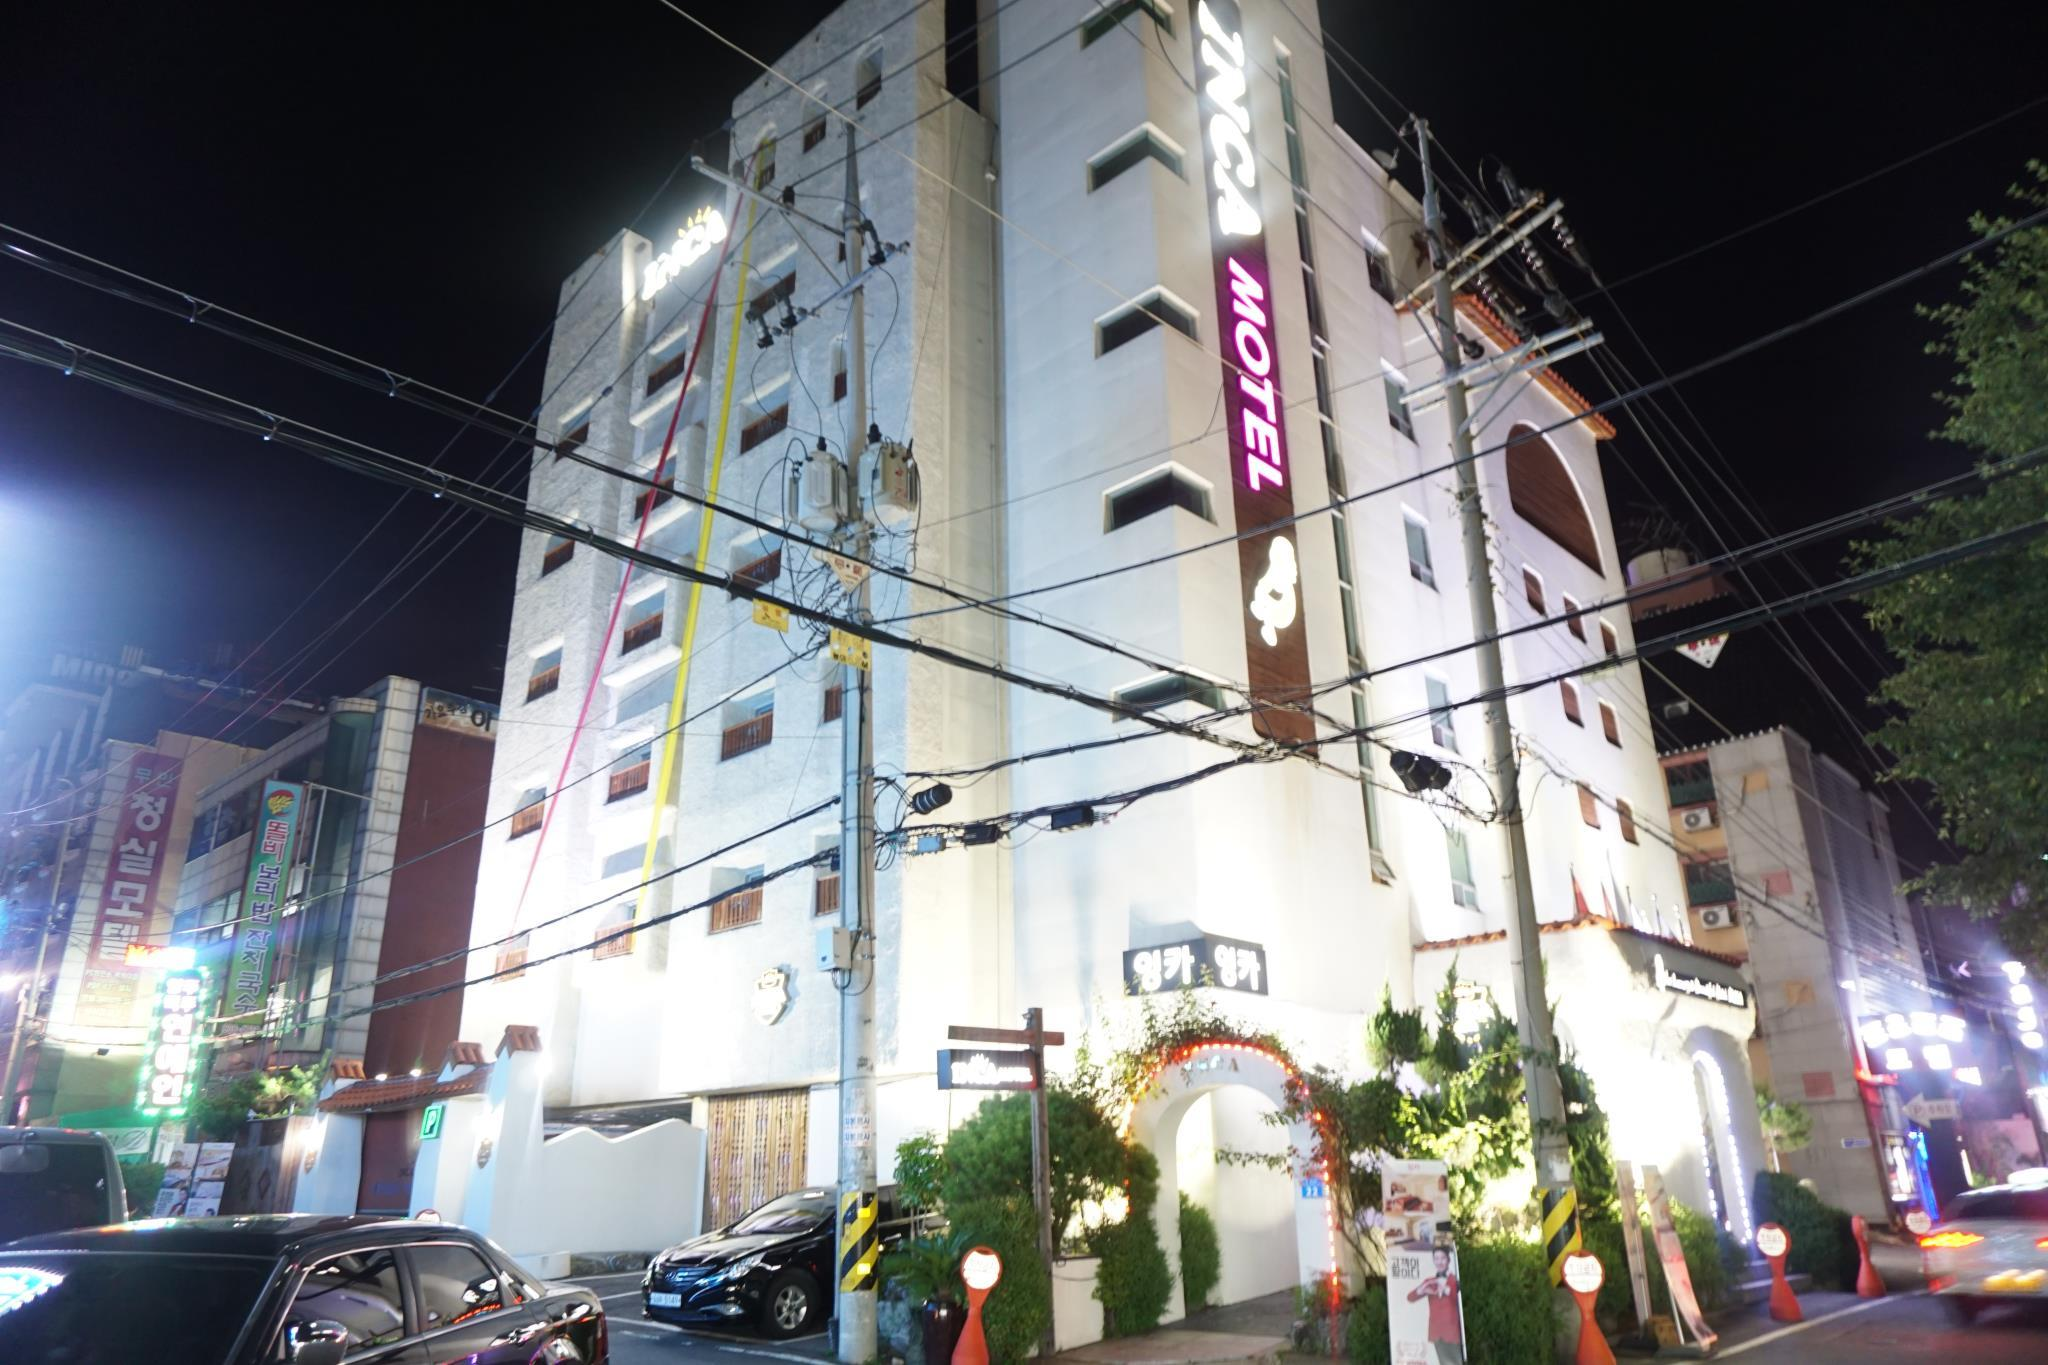 INCA Motel